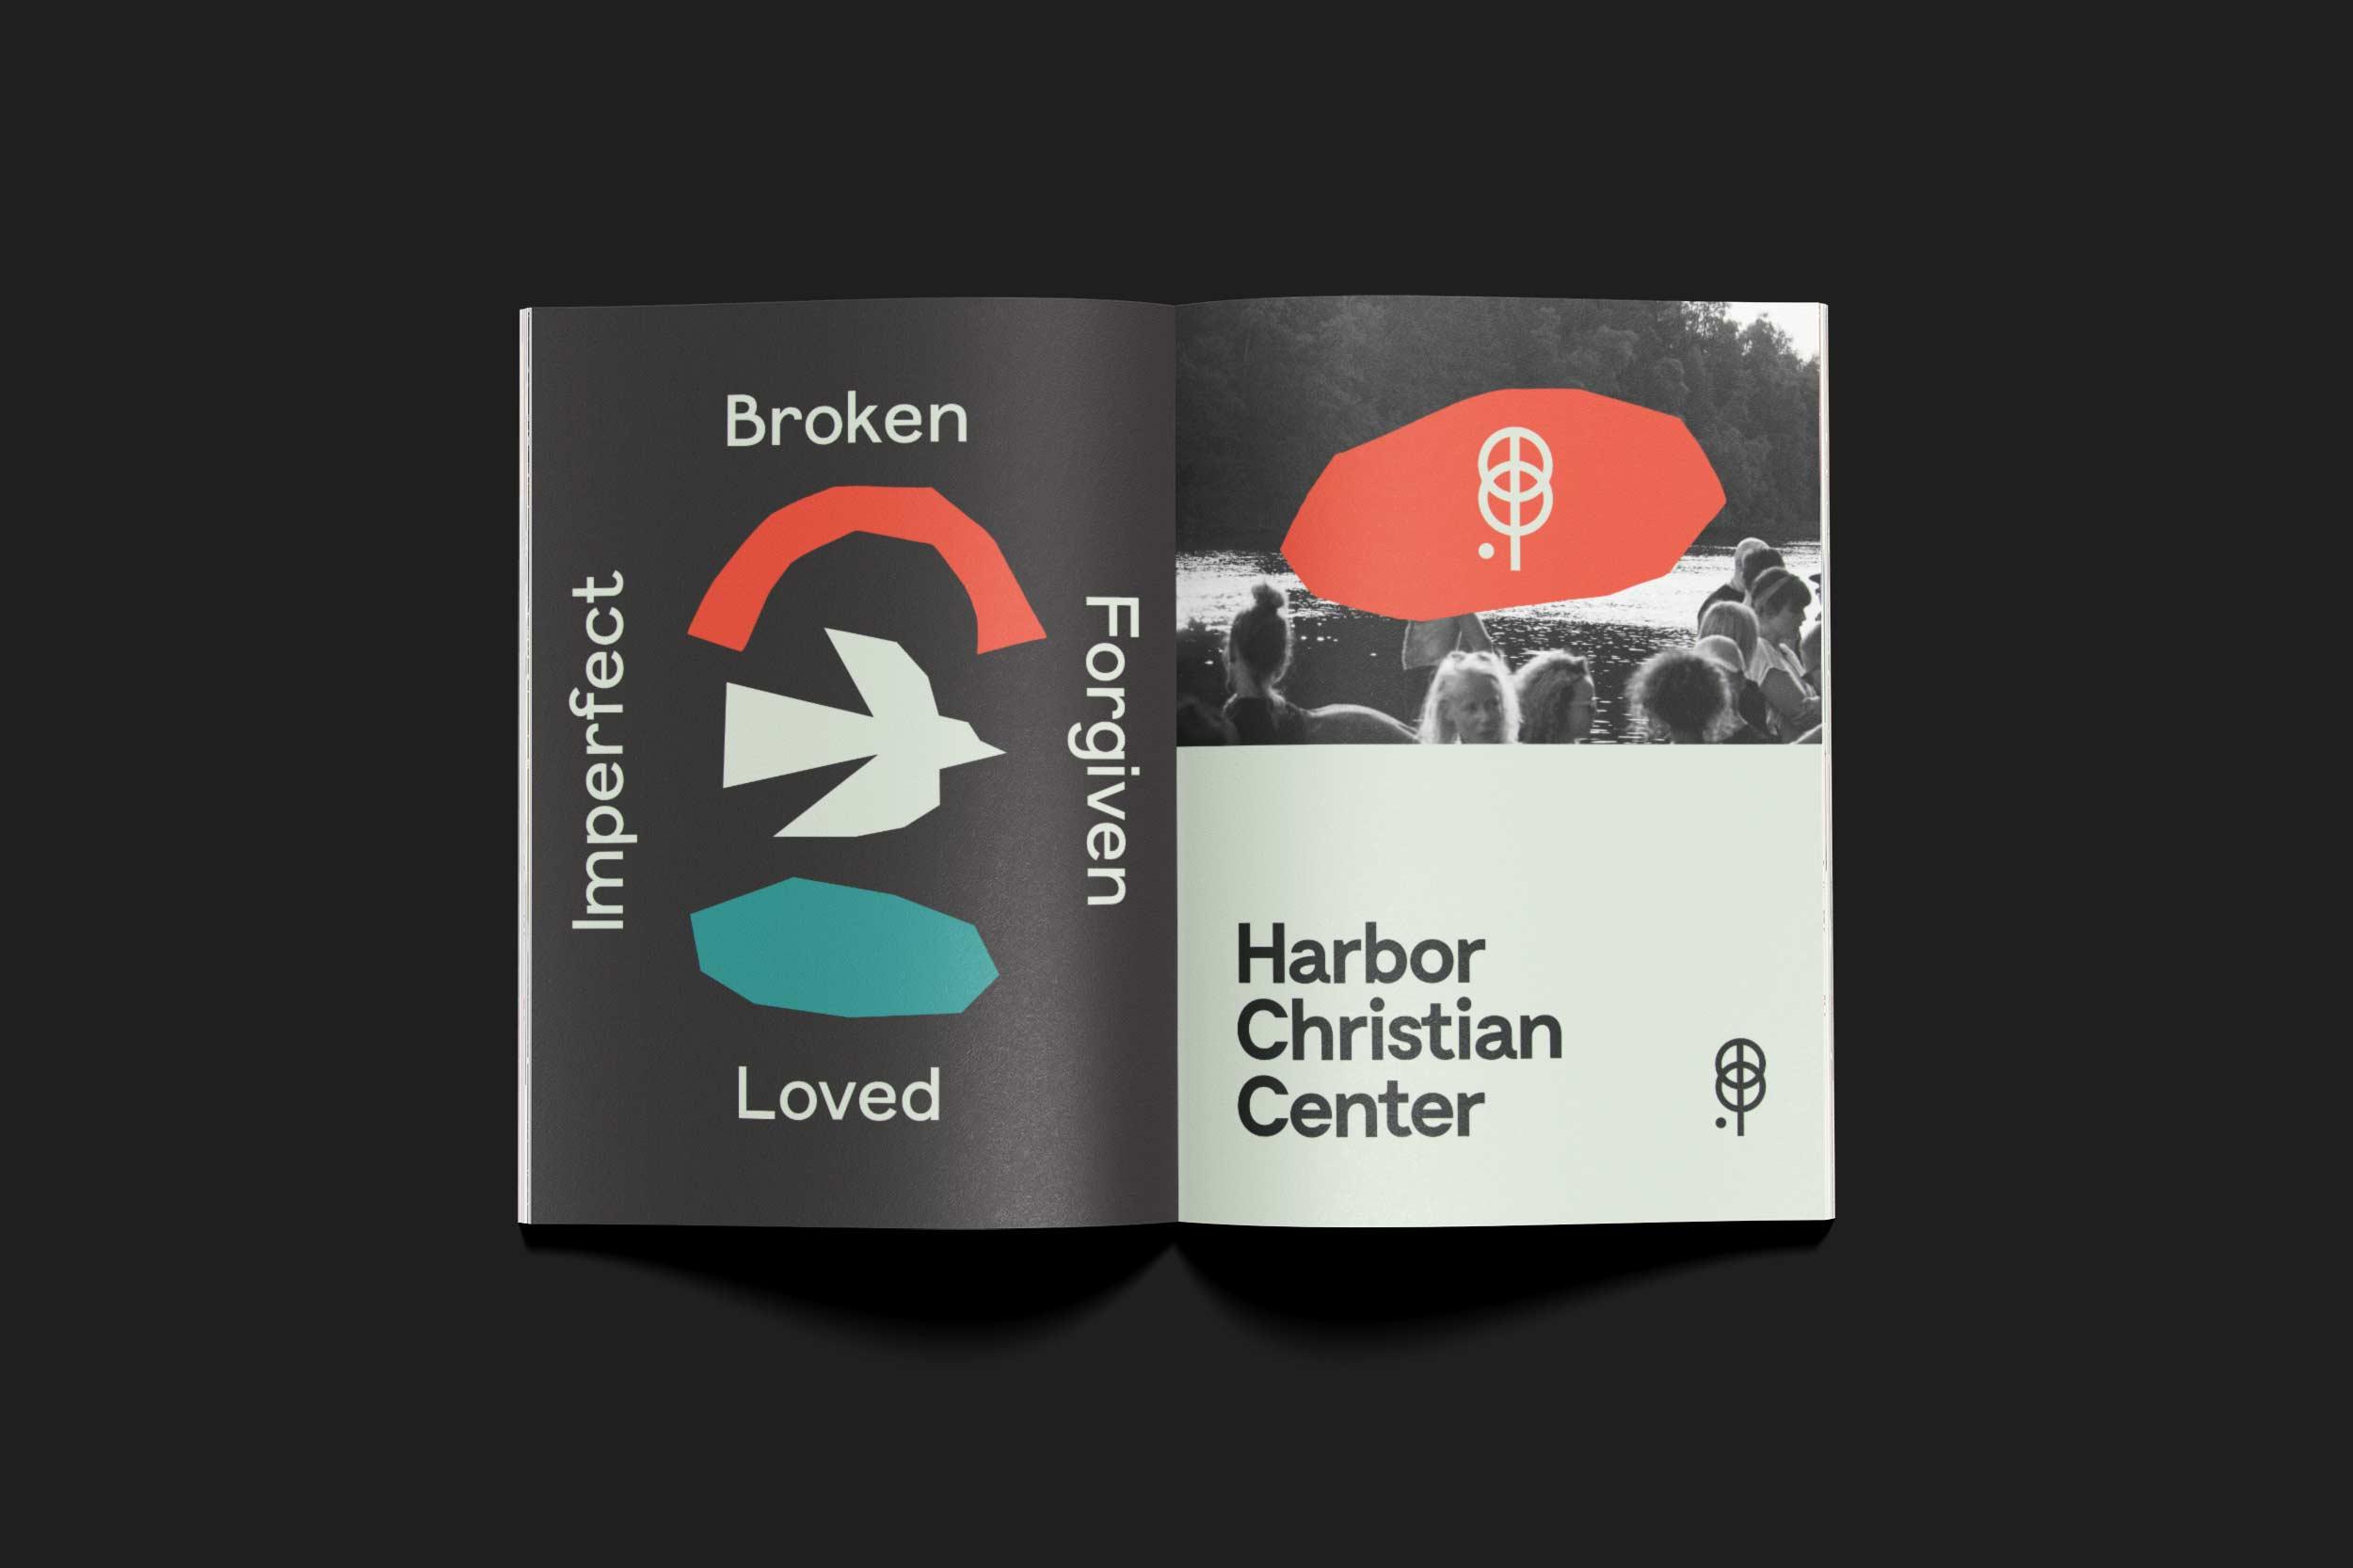 siotes-branding-seattle-tacoma-design-studio-branding-harbor-christian-center-church-5